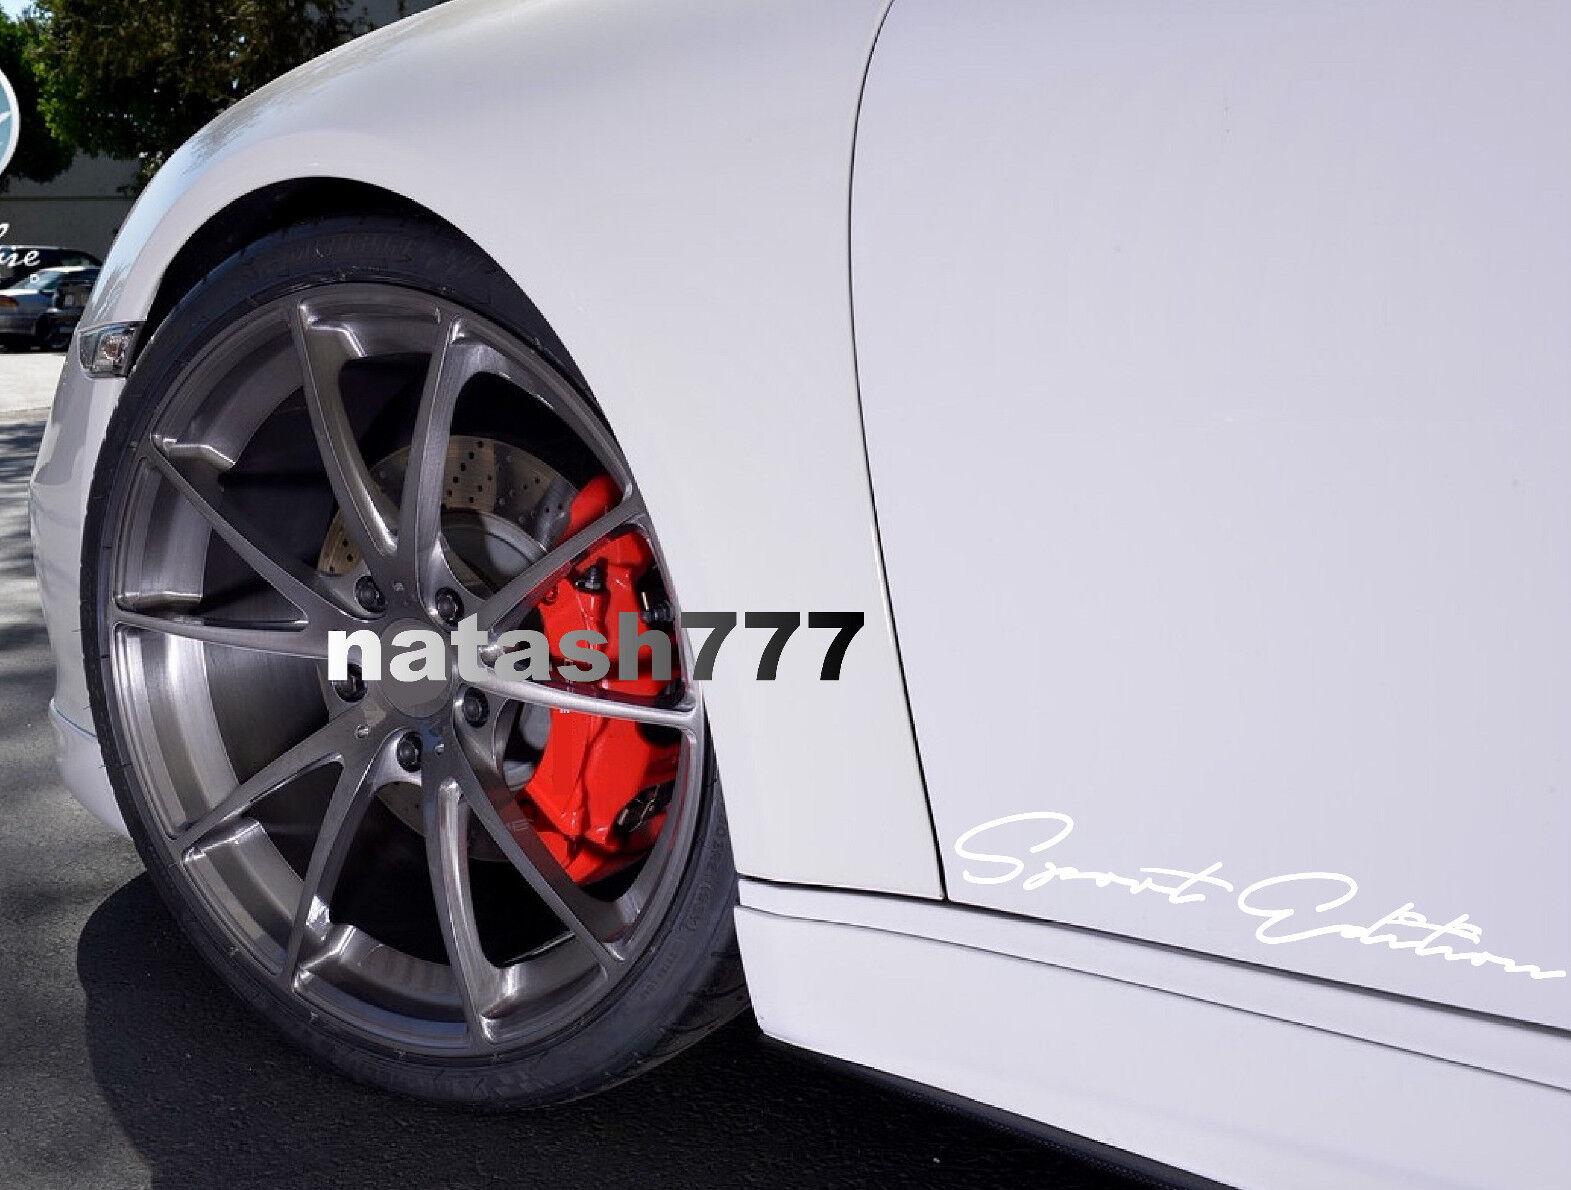 2Qty Rear Trunk Strut Lift Support Prop For Lexus GS300 GS350 GS430 GS450h GS460